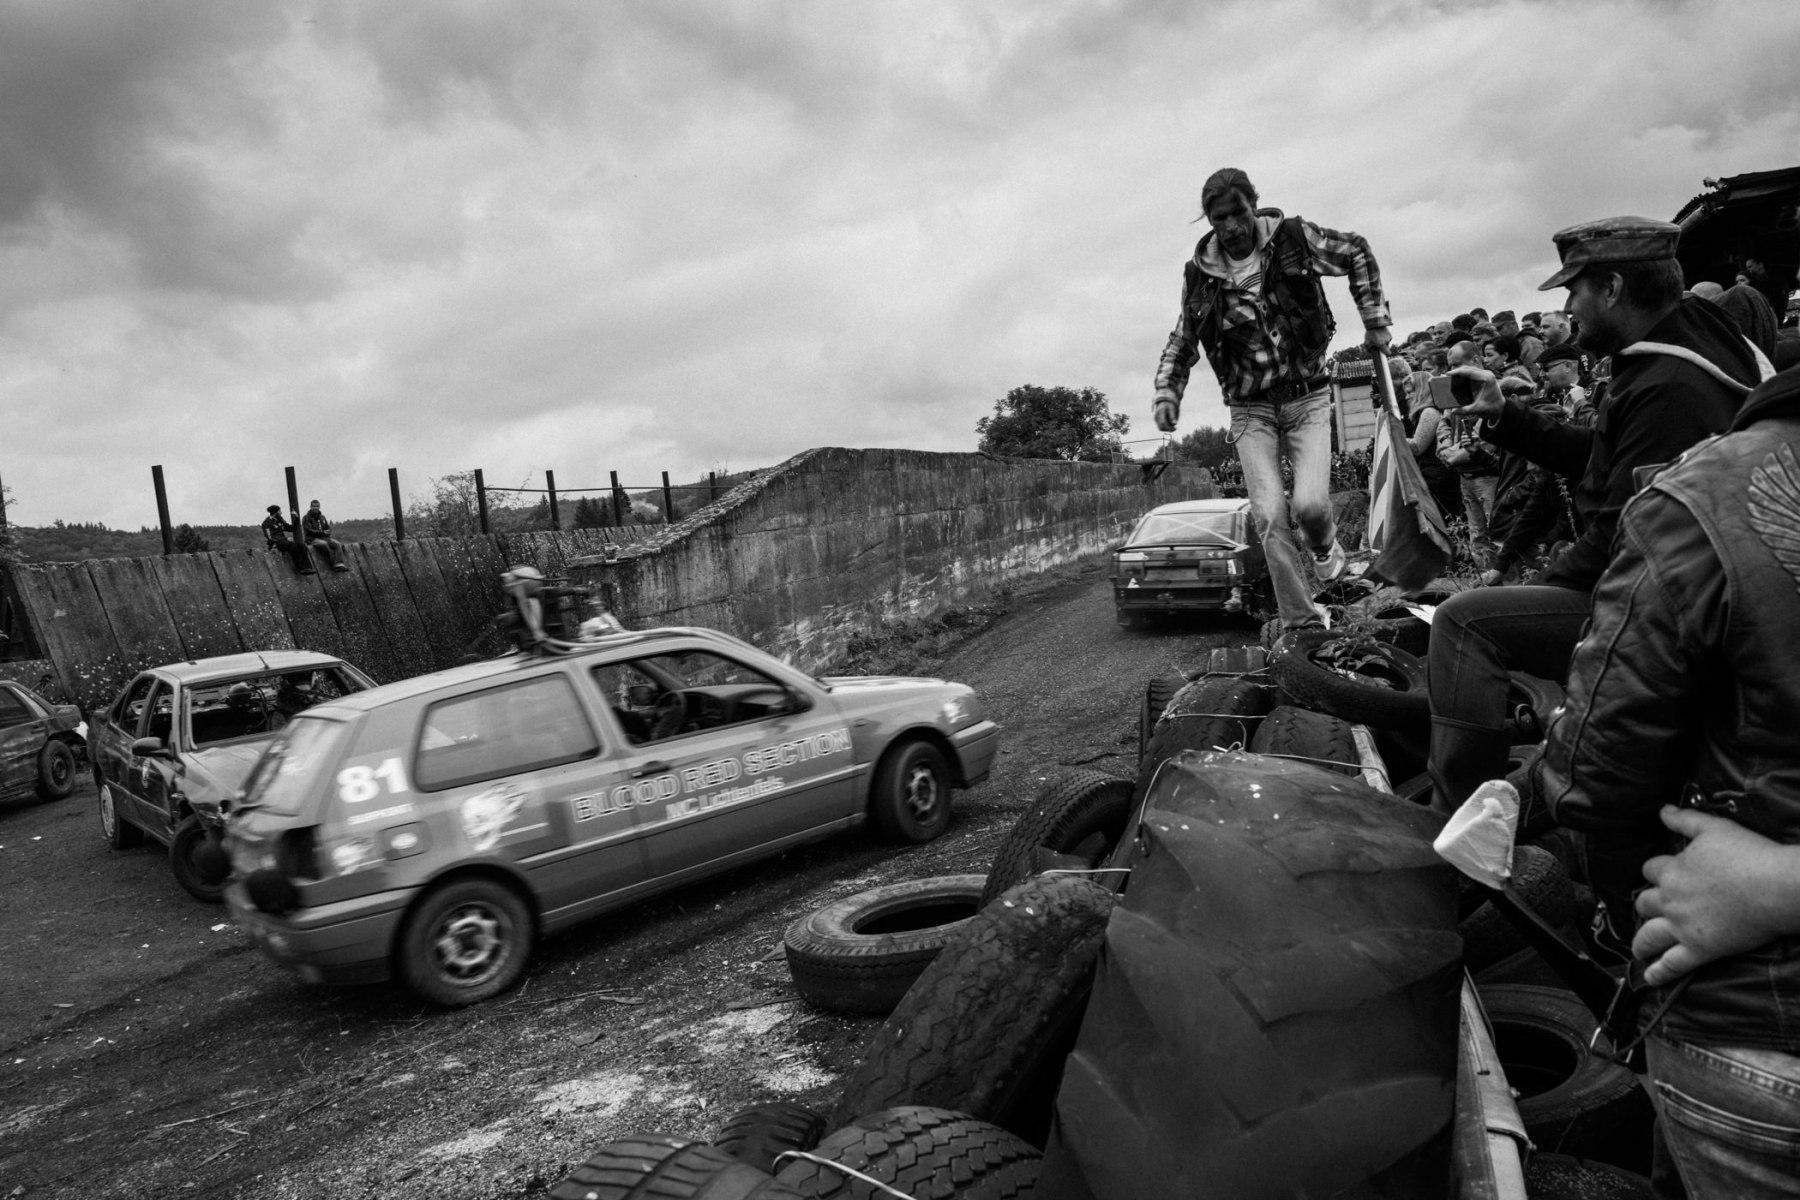 kevin_v_ton_Crash-Cars_11